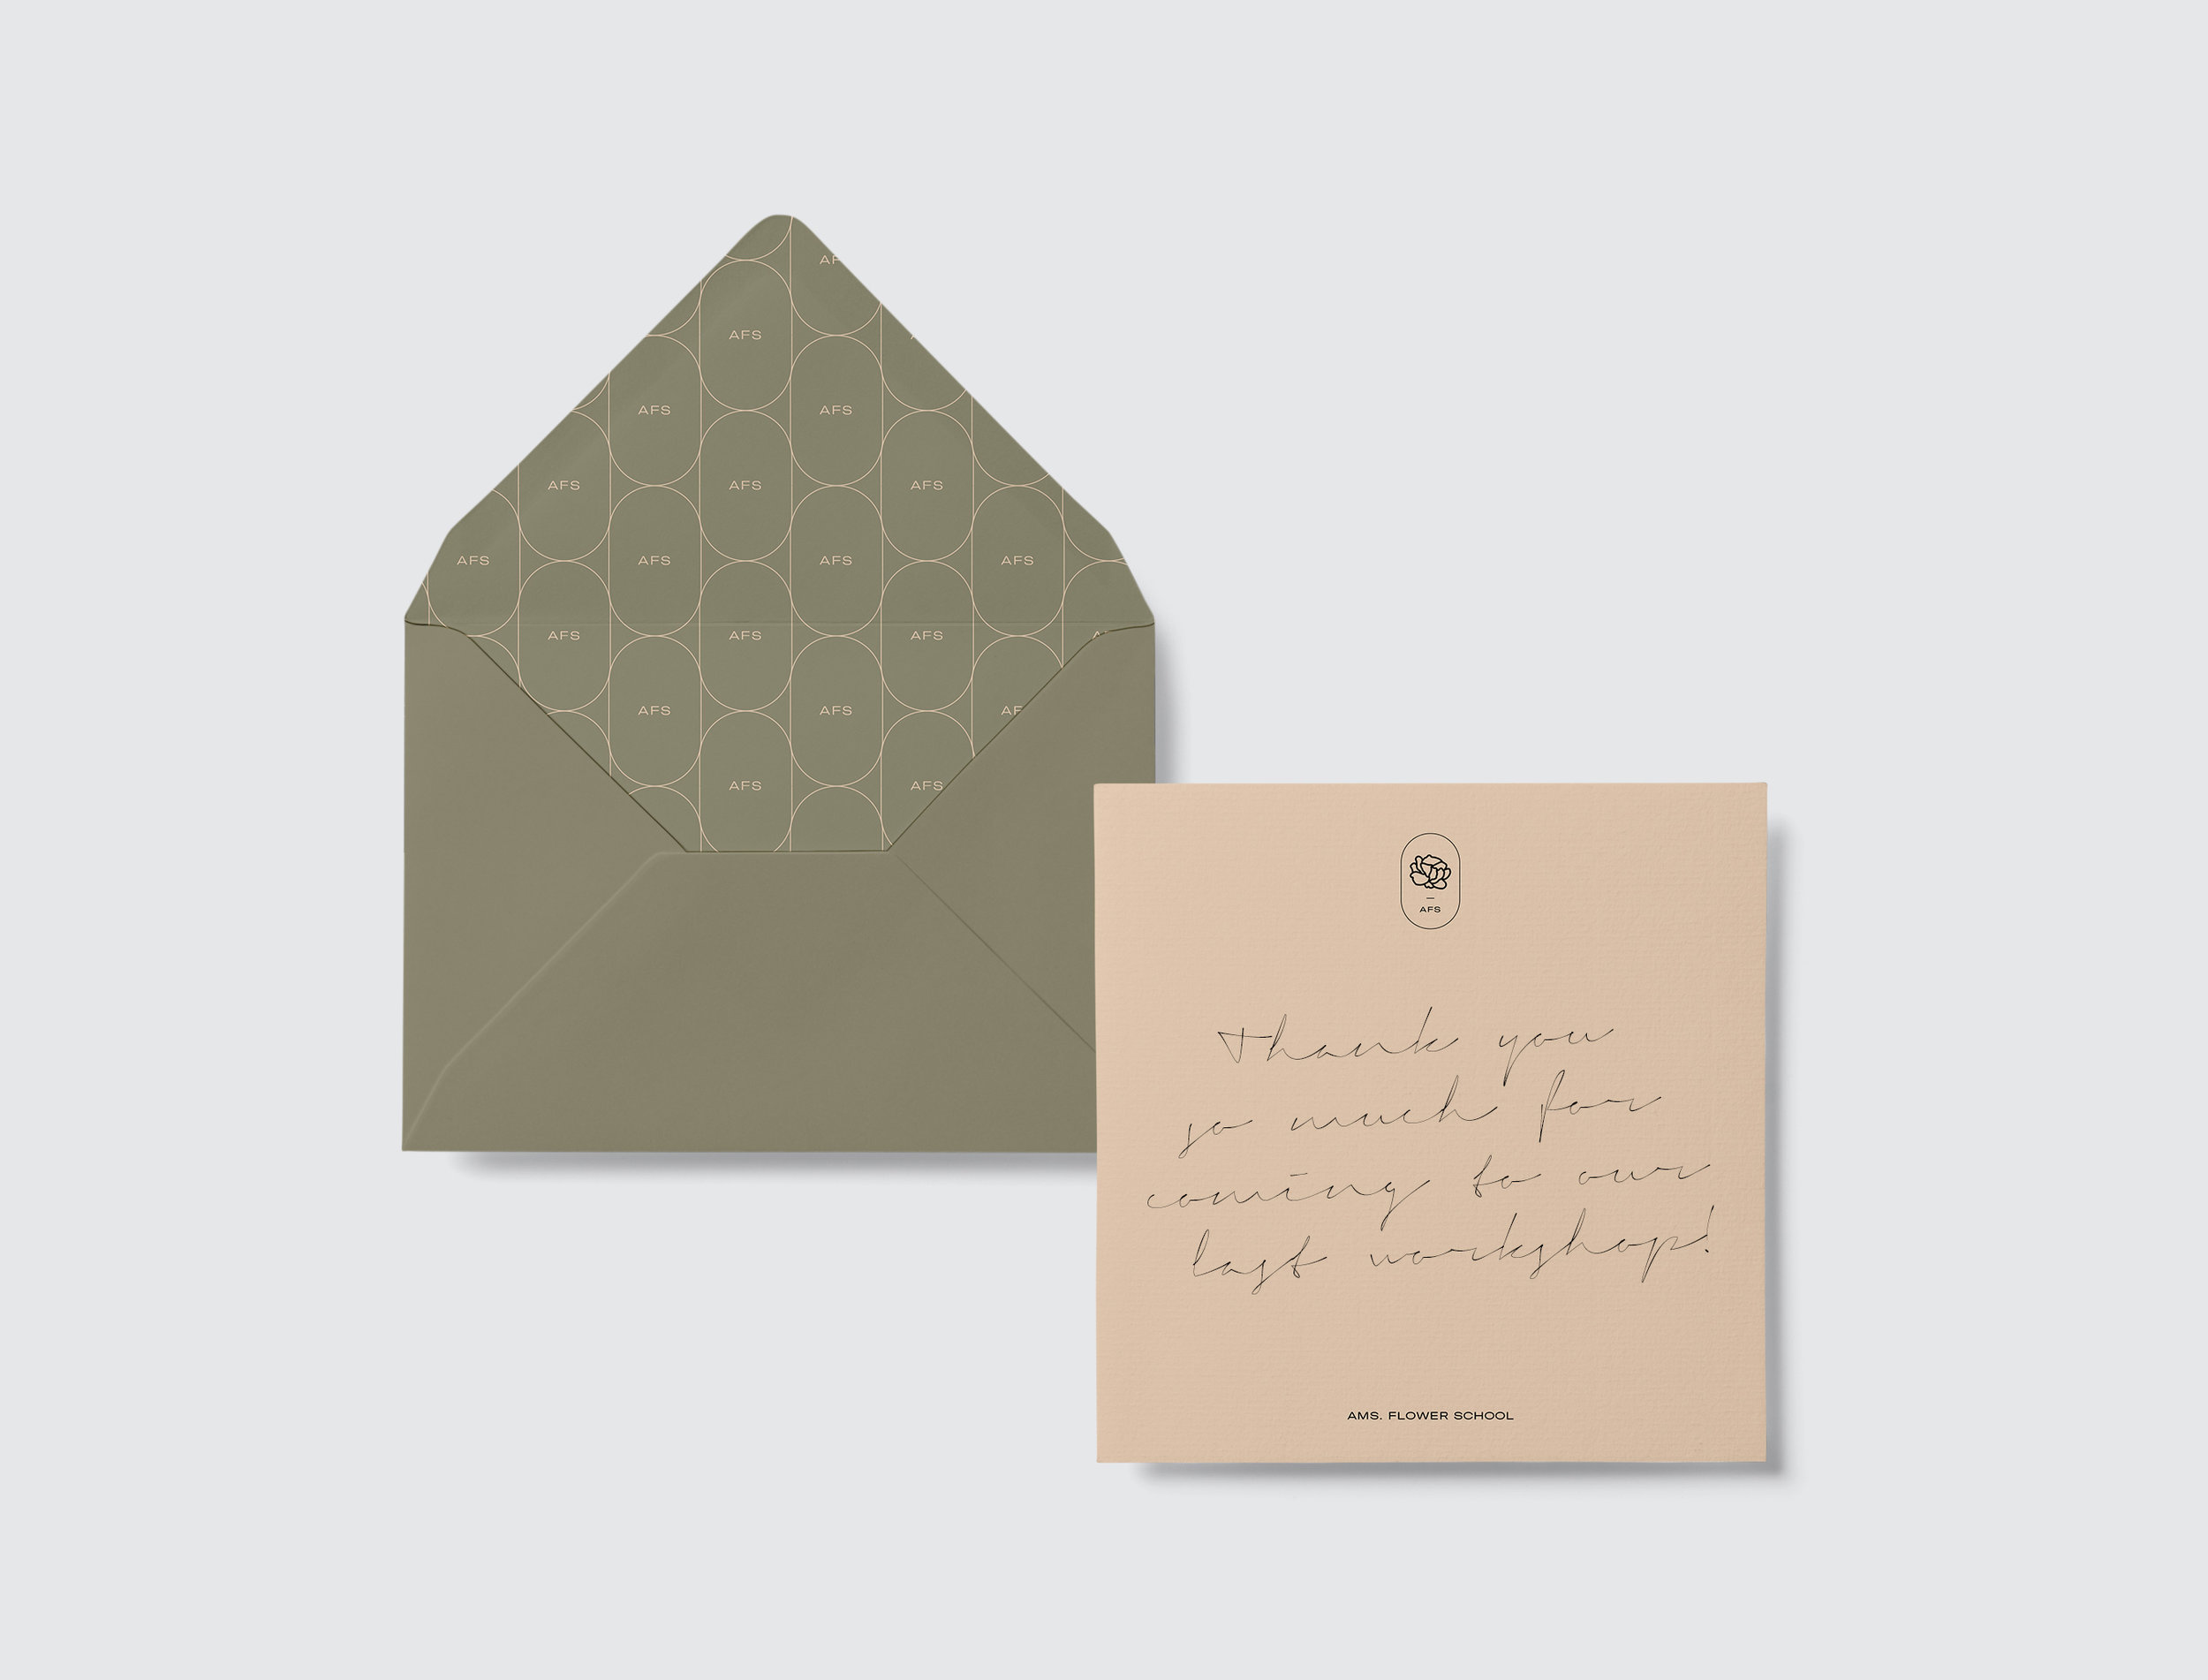 Enveloppe-brand-identity-amsterdam-flower-school.jpg